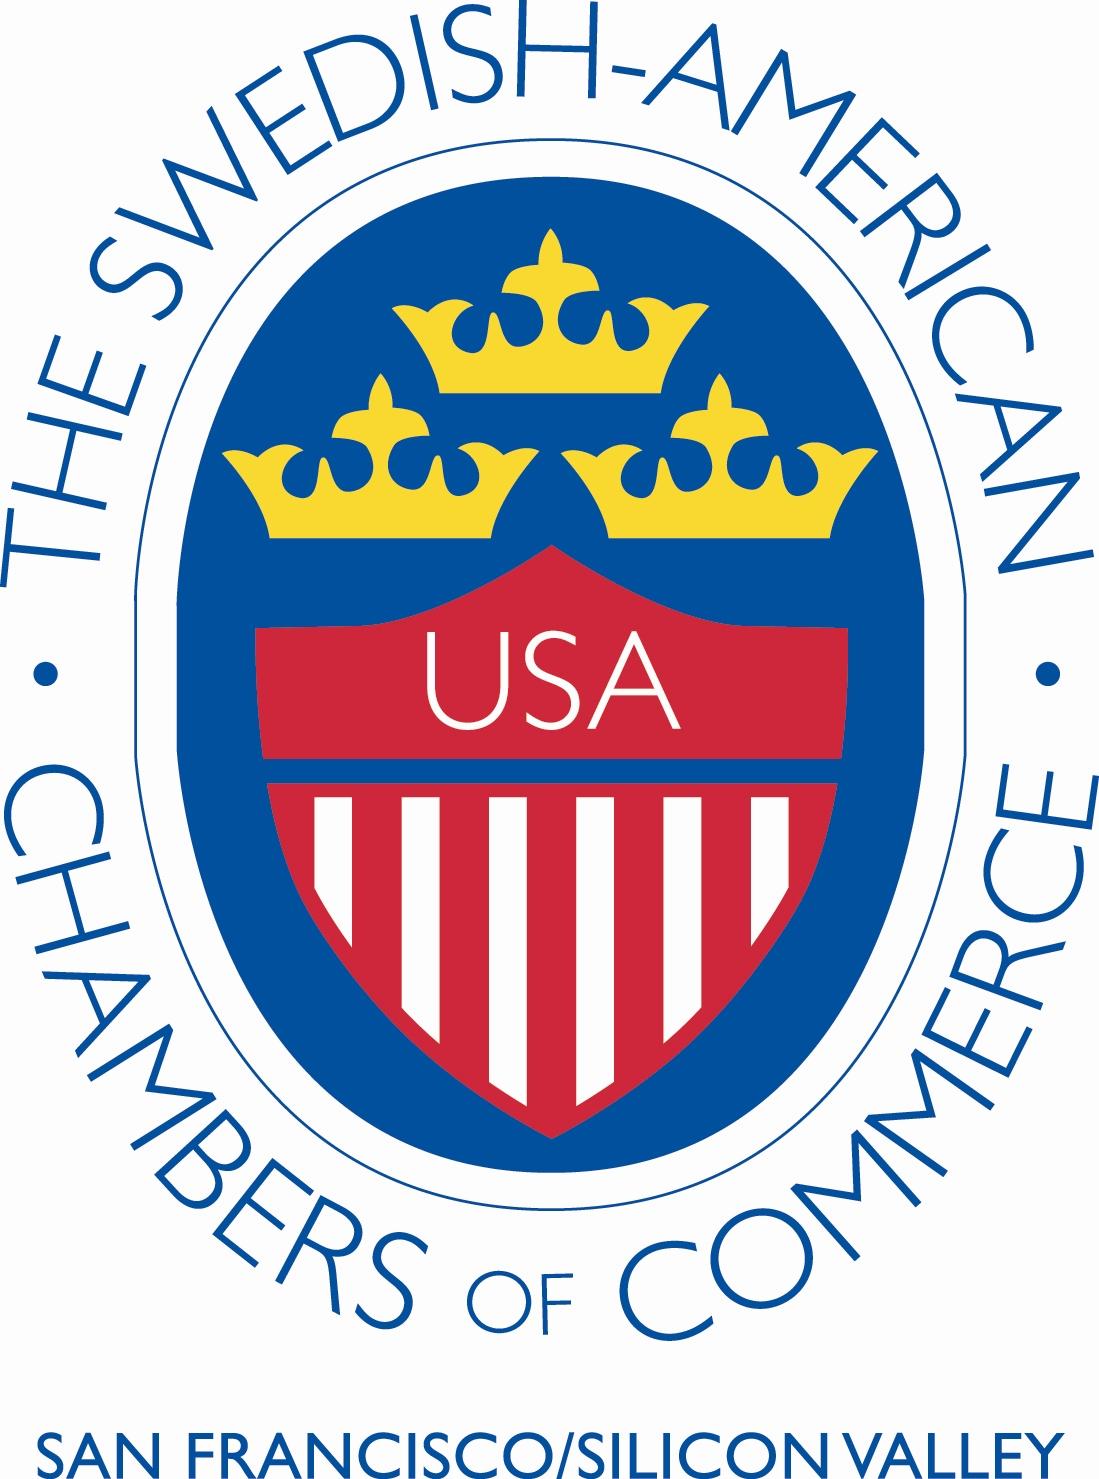 Swedish American Chamber of Commerce SF/SV